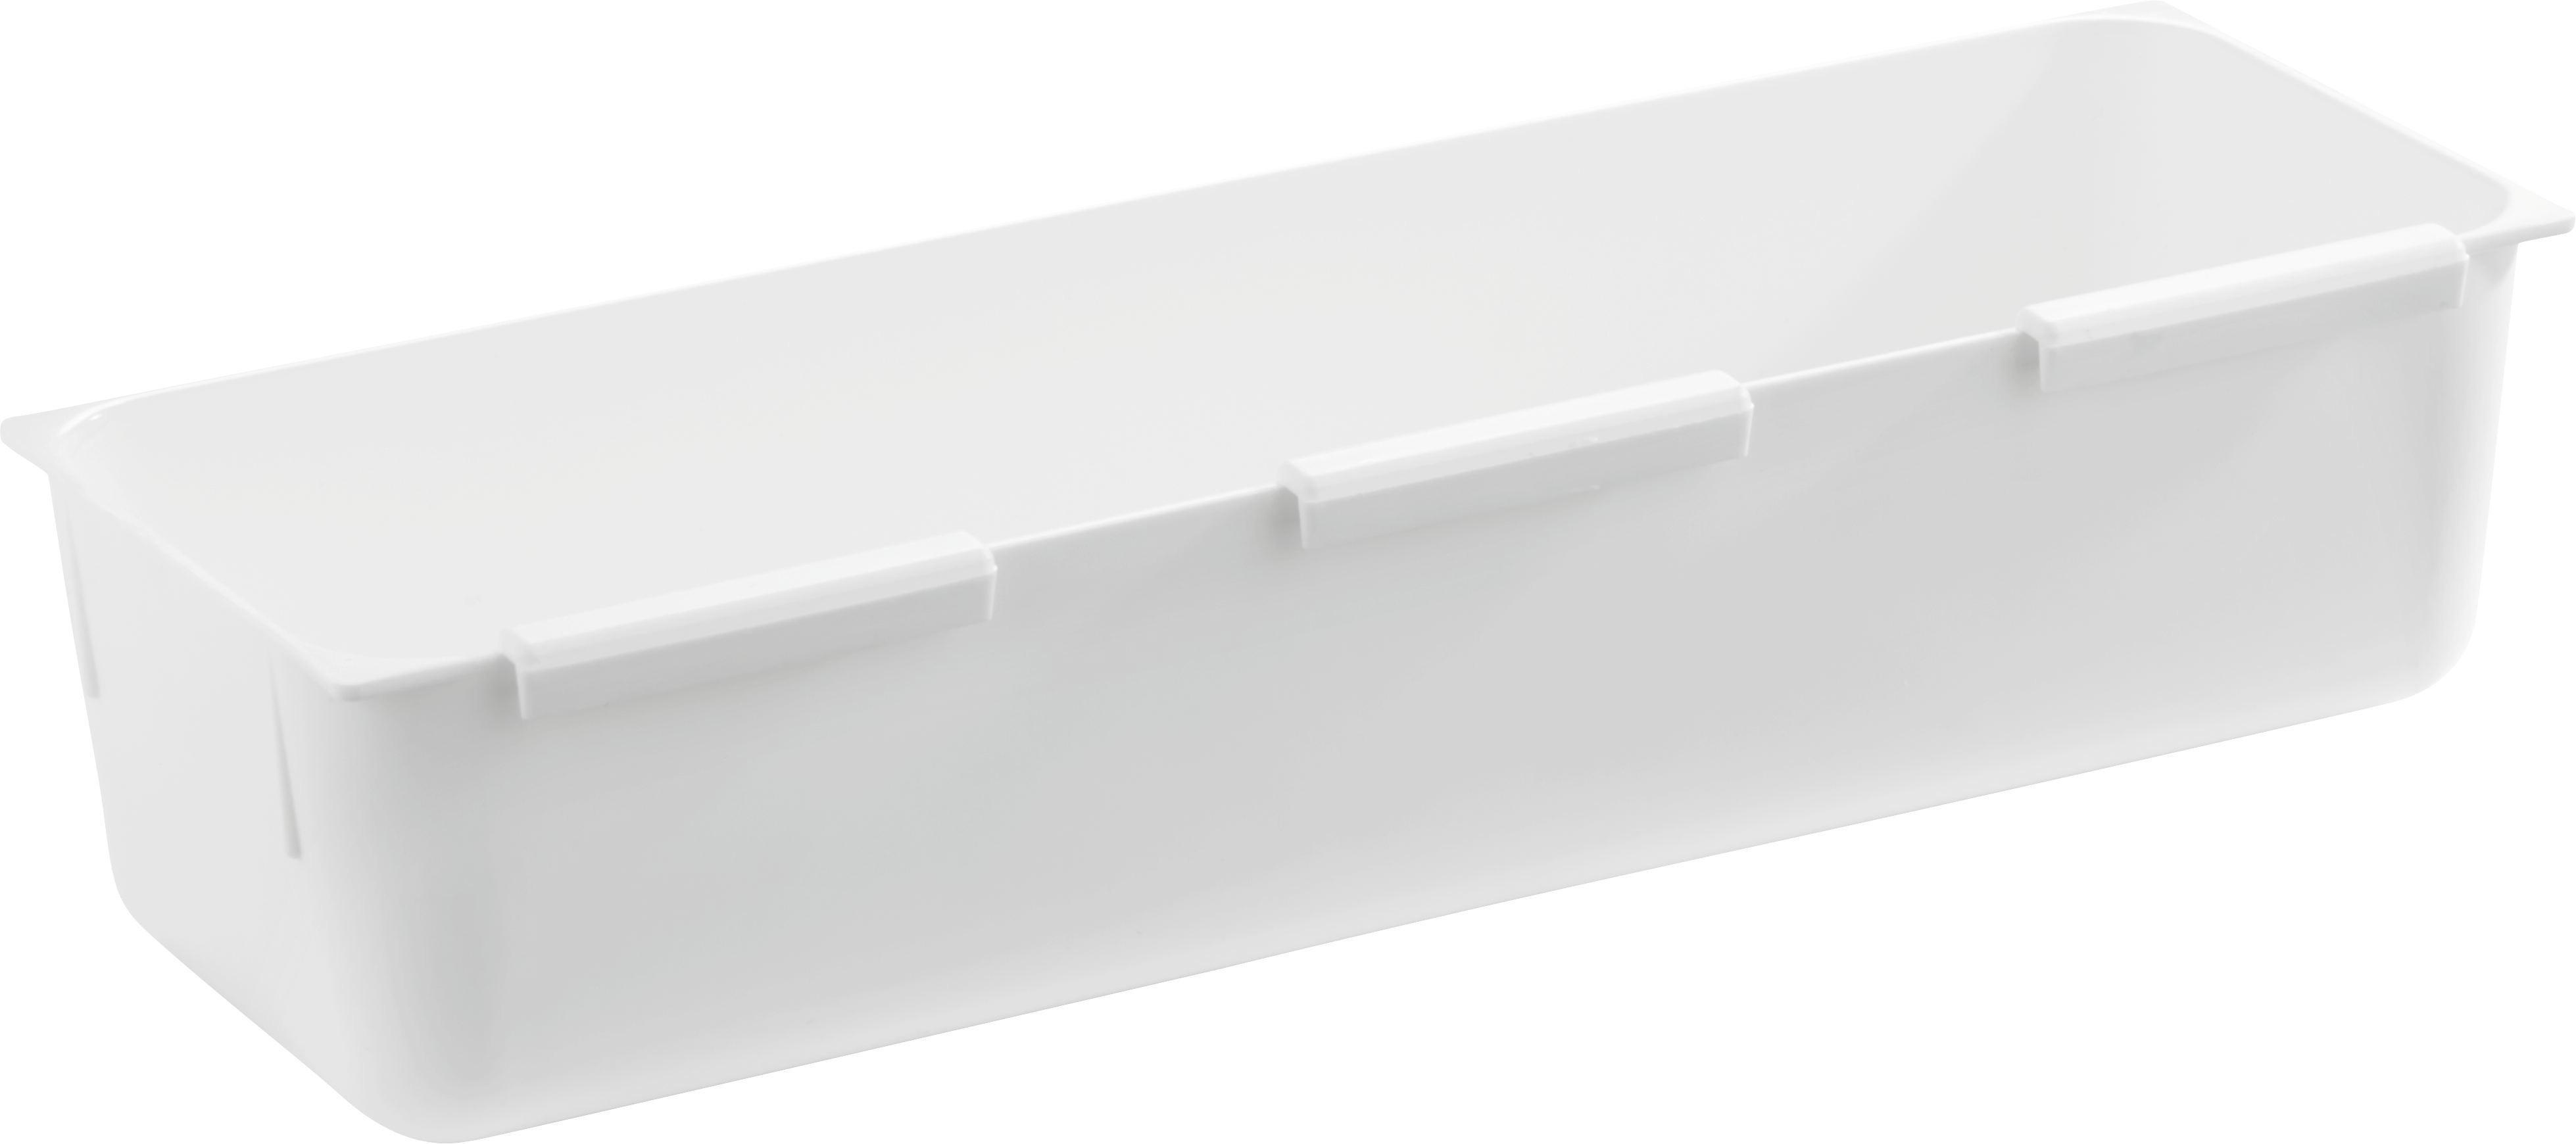 Tárolódoboz Műanyag - fehér, műanyag (7,5/22,5cm)